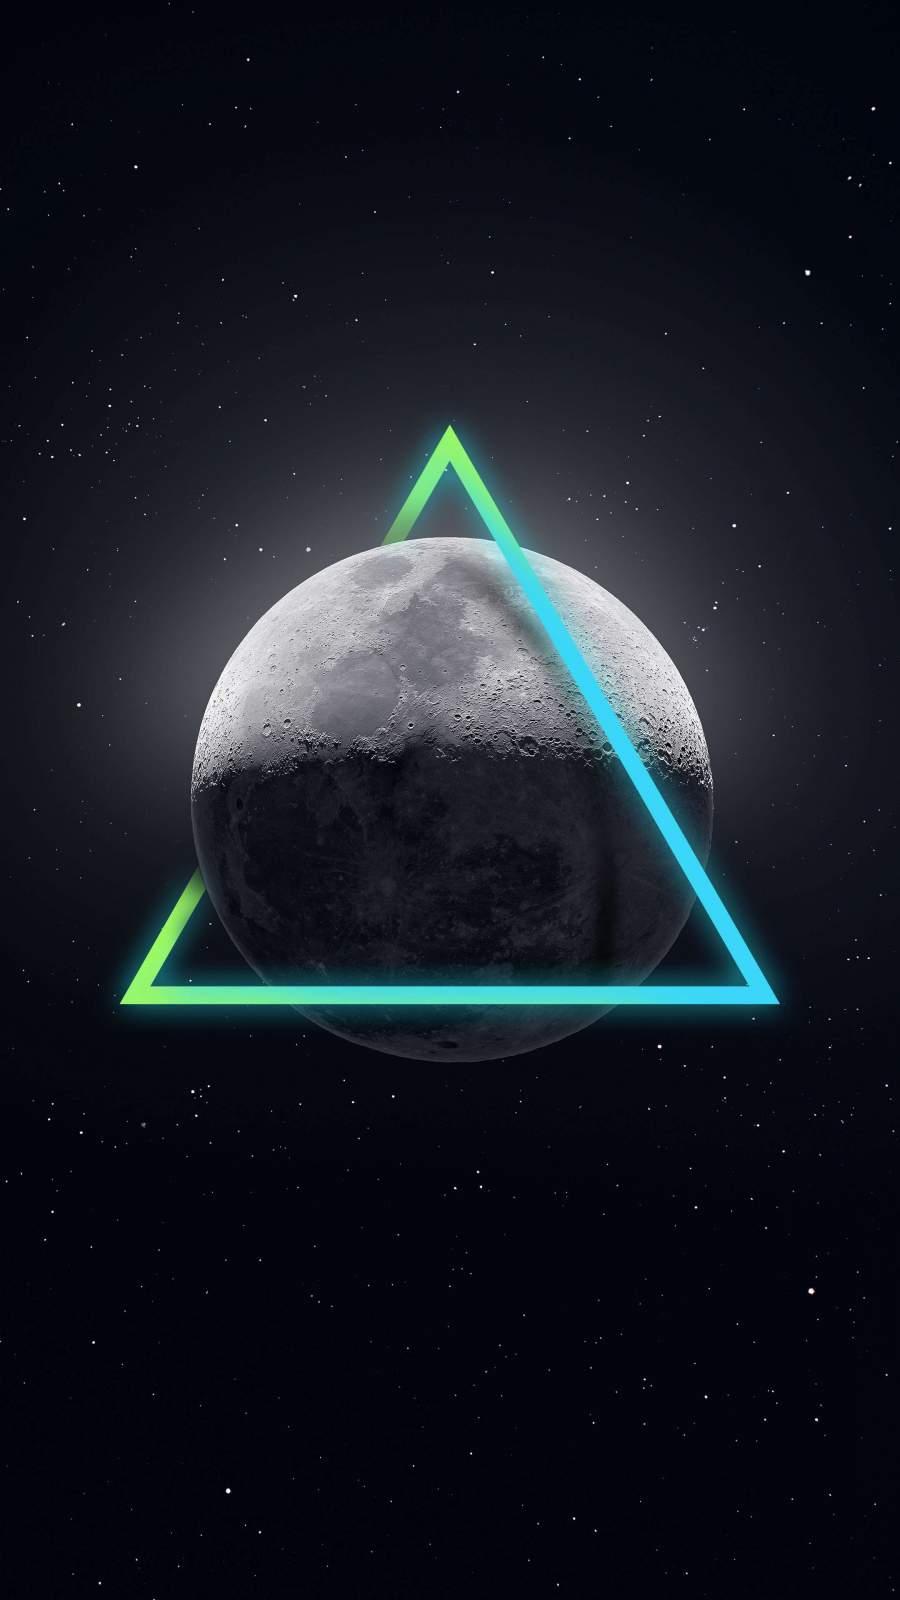 Moon Triangle iPhone Wallpaper iPhone Wallpaper